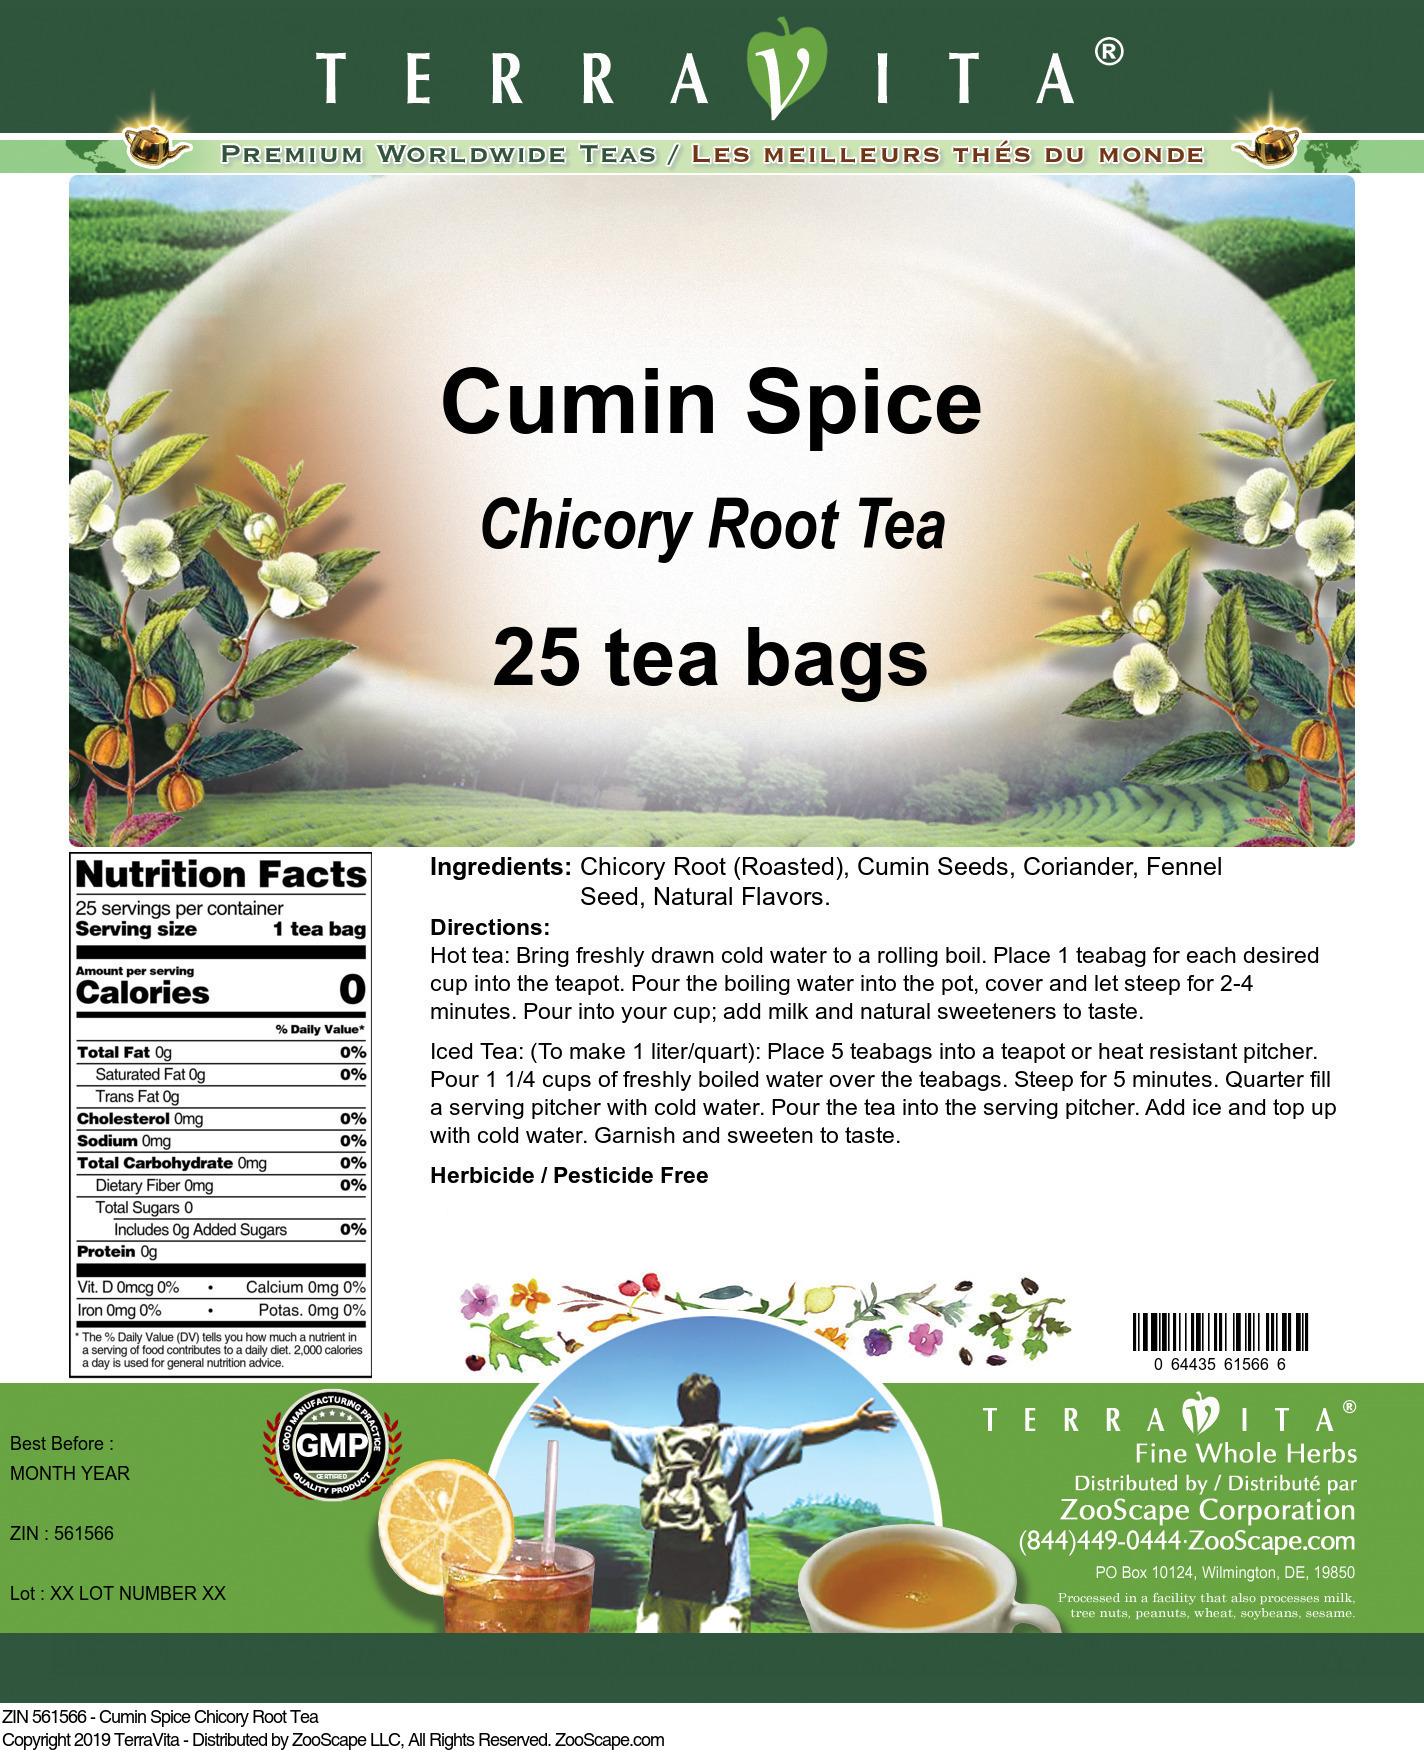 Cumin Spice Chicory Root Tea